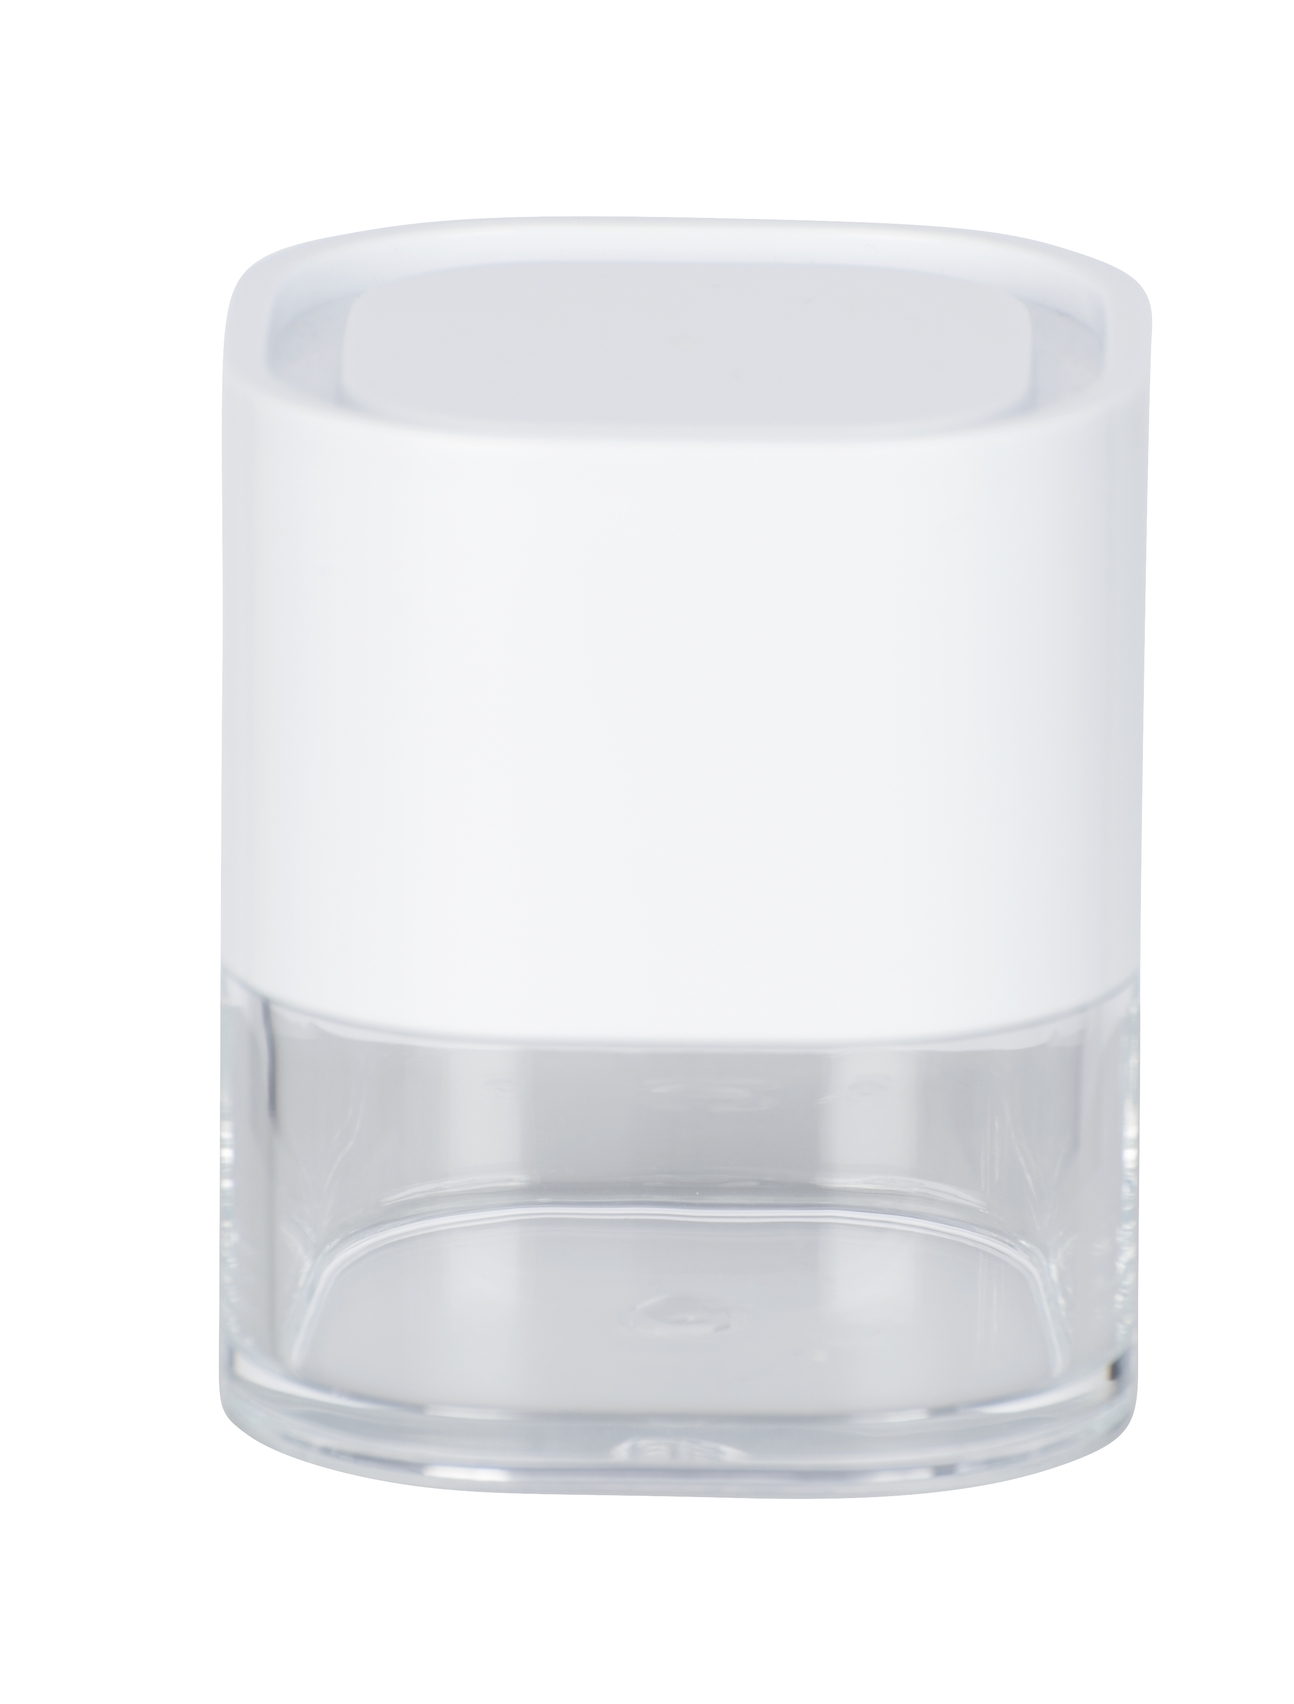 Recipient pentru dischete demachiante, din acril Oria Alb, L7,5xl7,5xH8,5 cm imagine